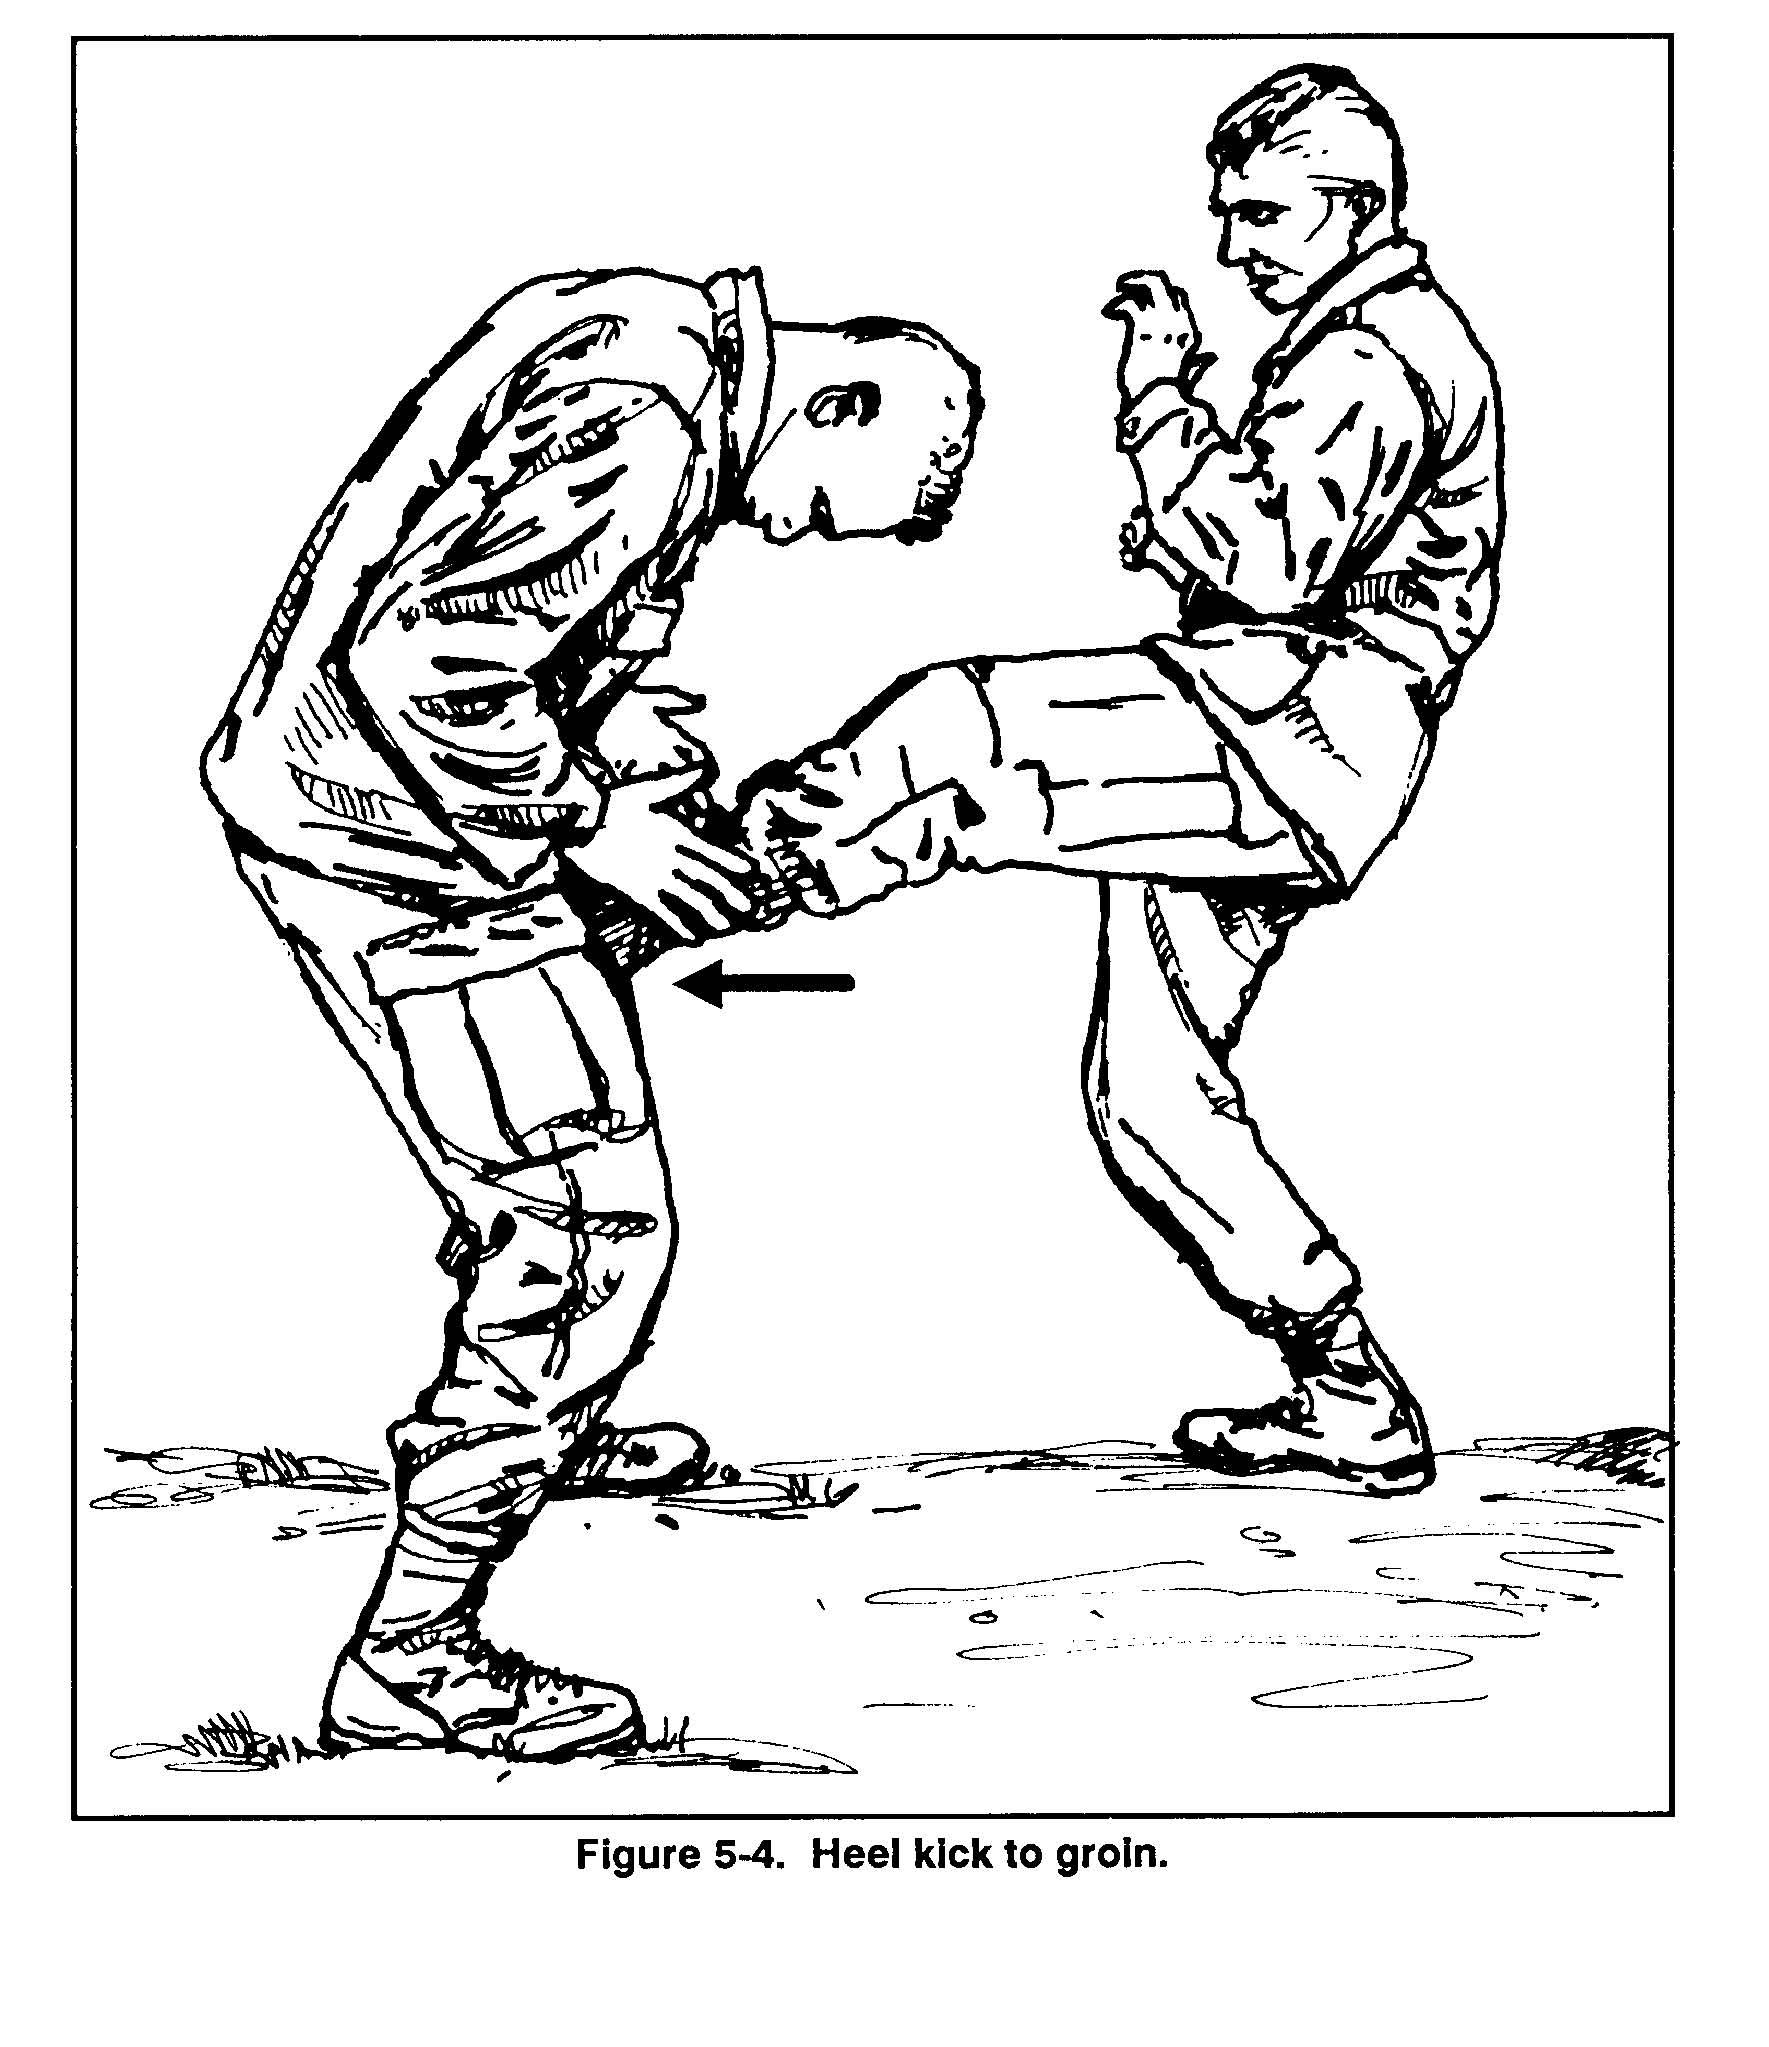 Shin Kick. The shin kick is a powerful kick, and it is